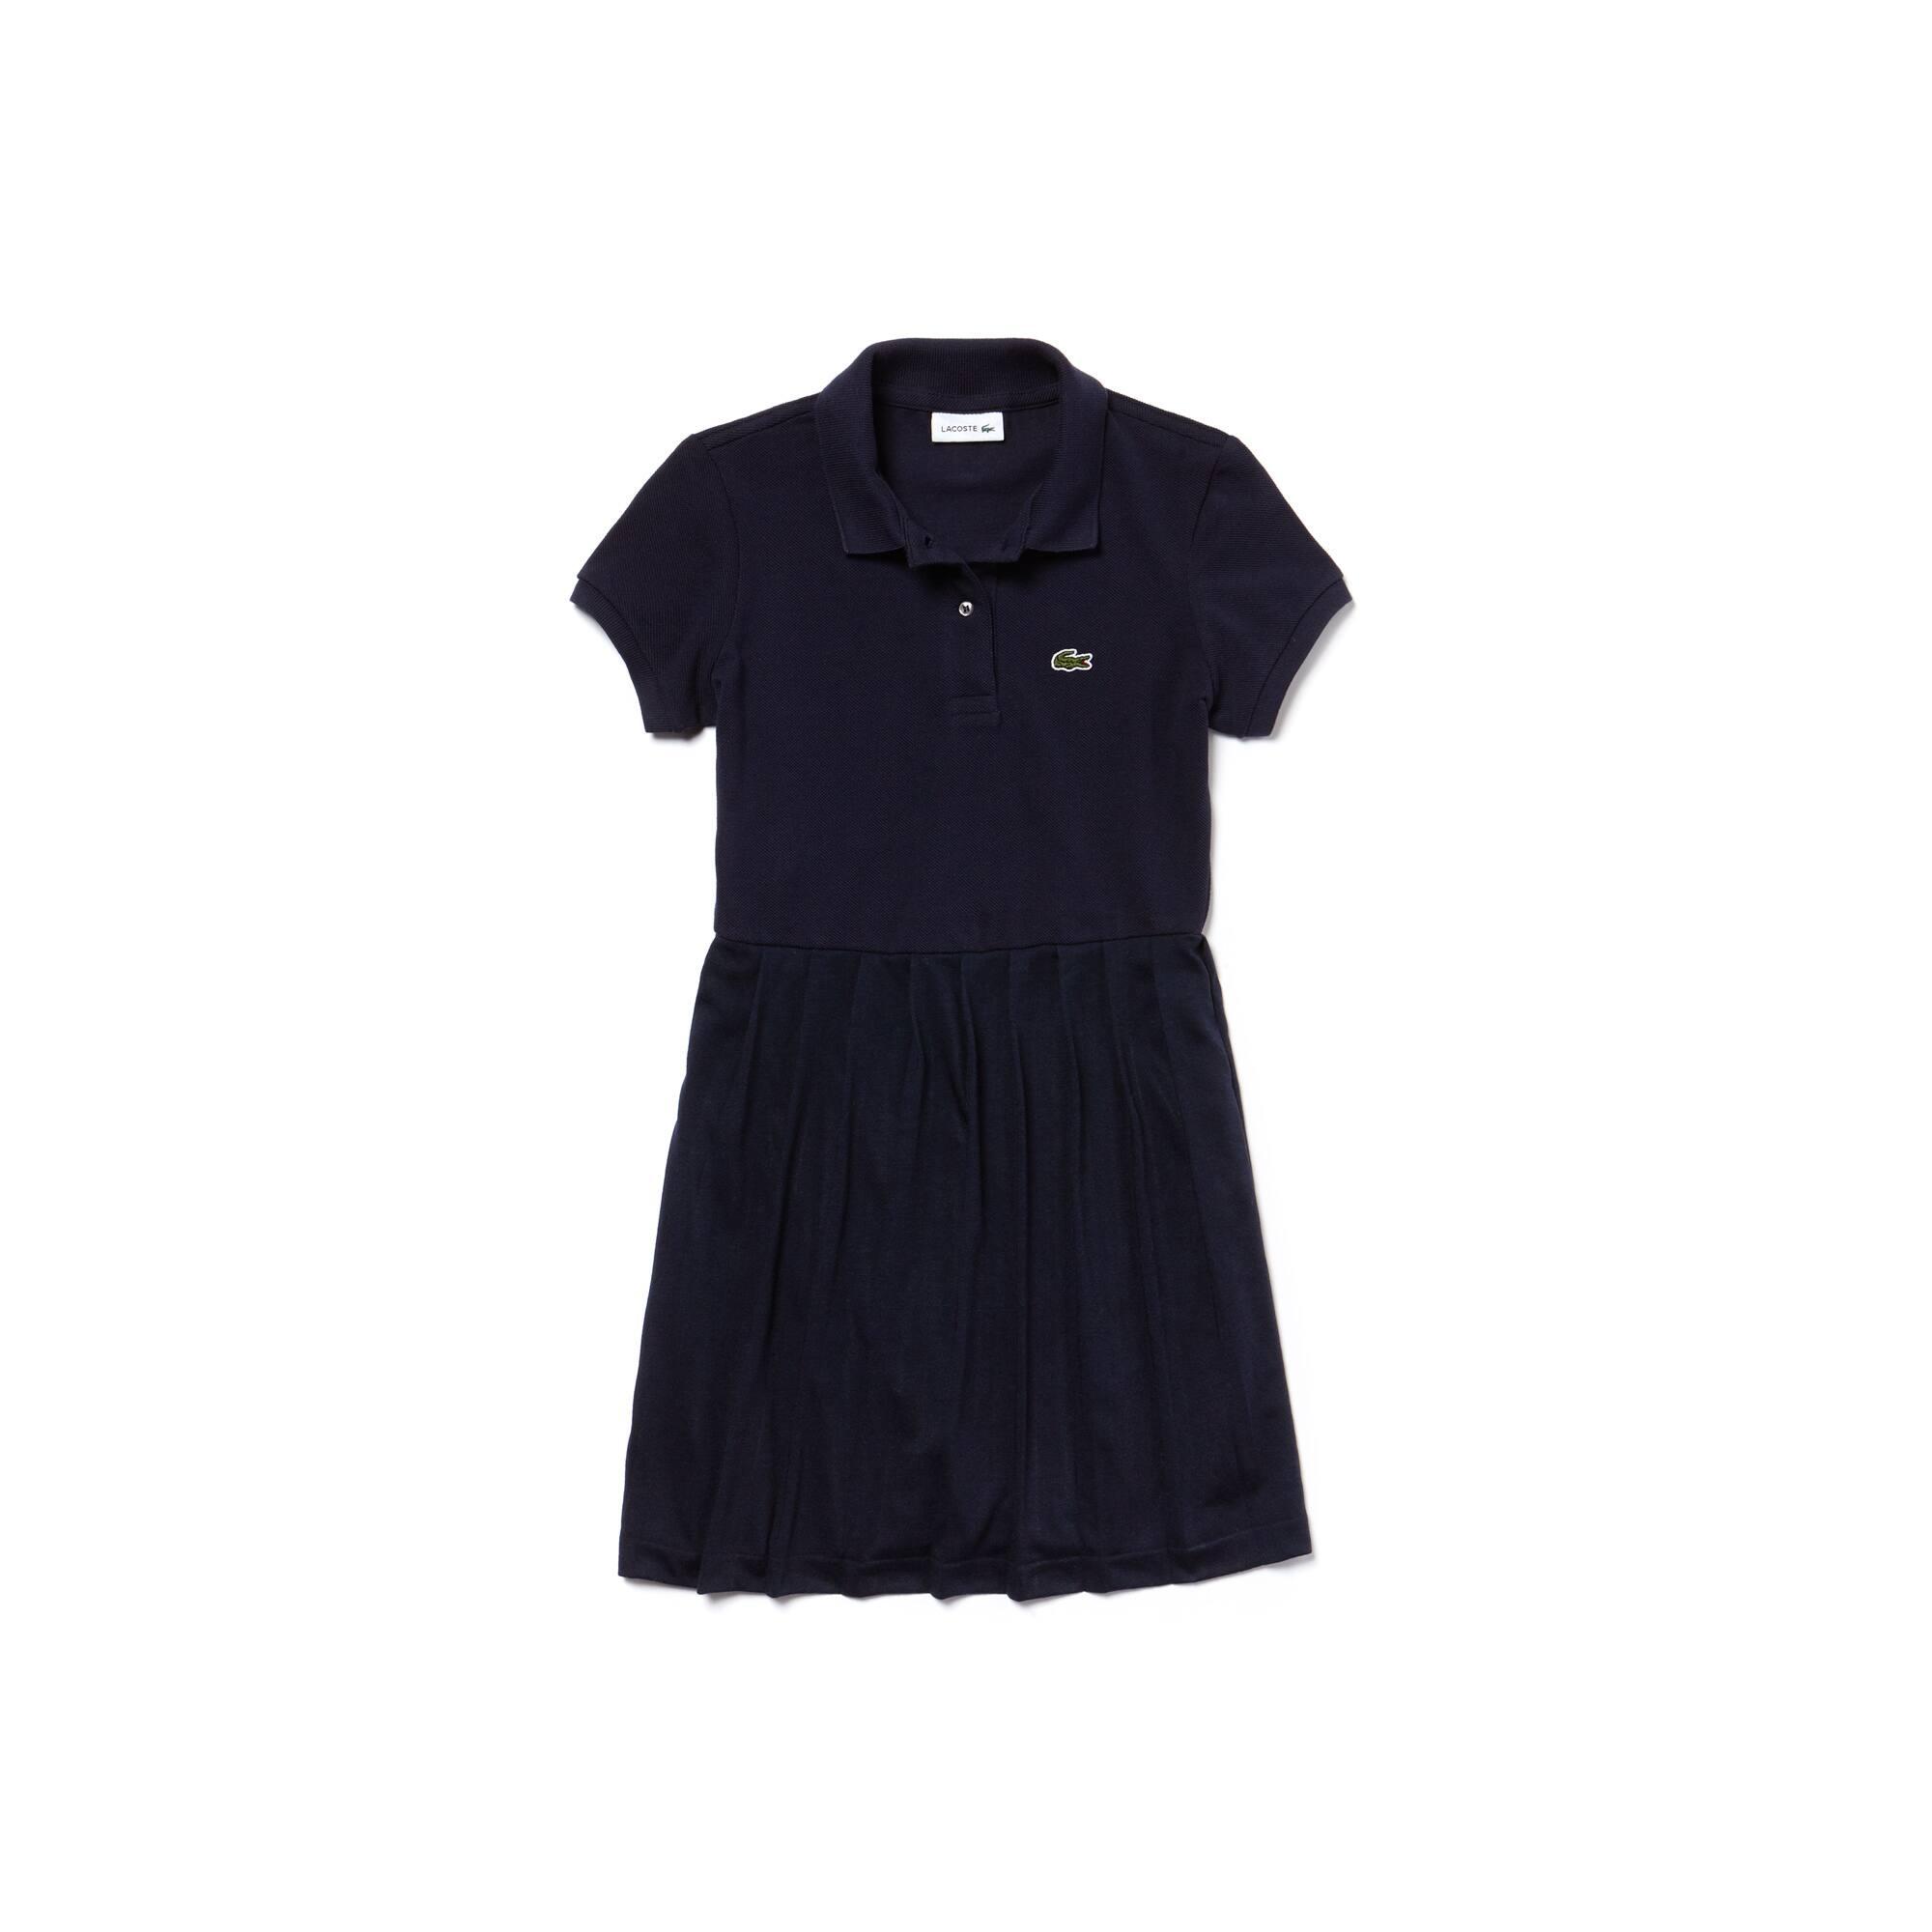 Girls' Pleated Cotton Petit Piqué Polo Dress